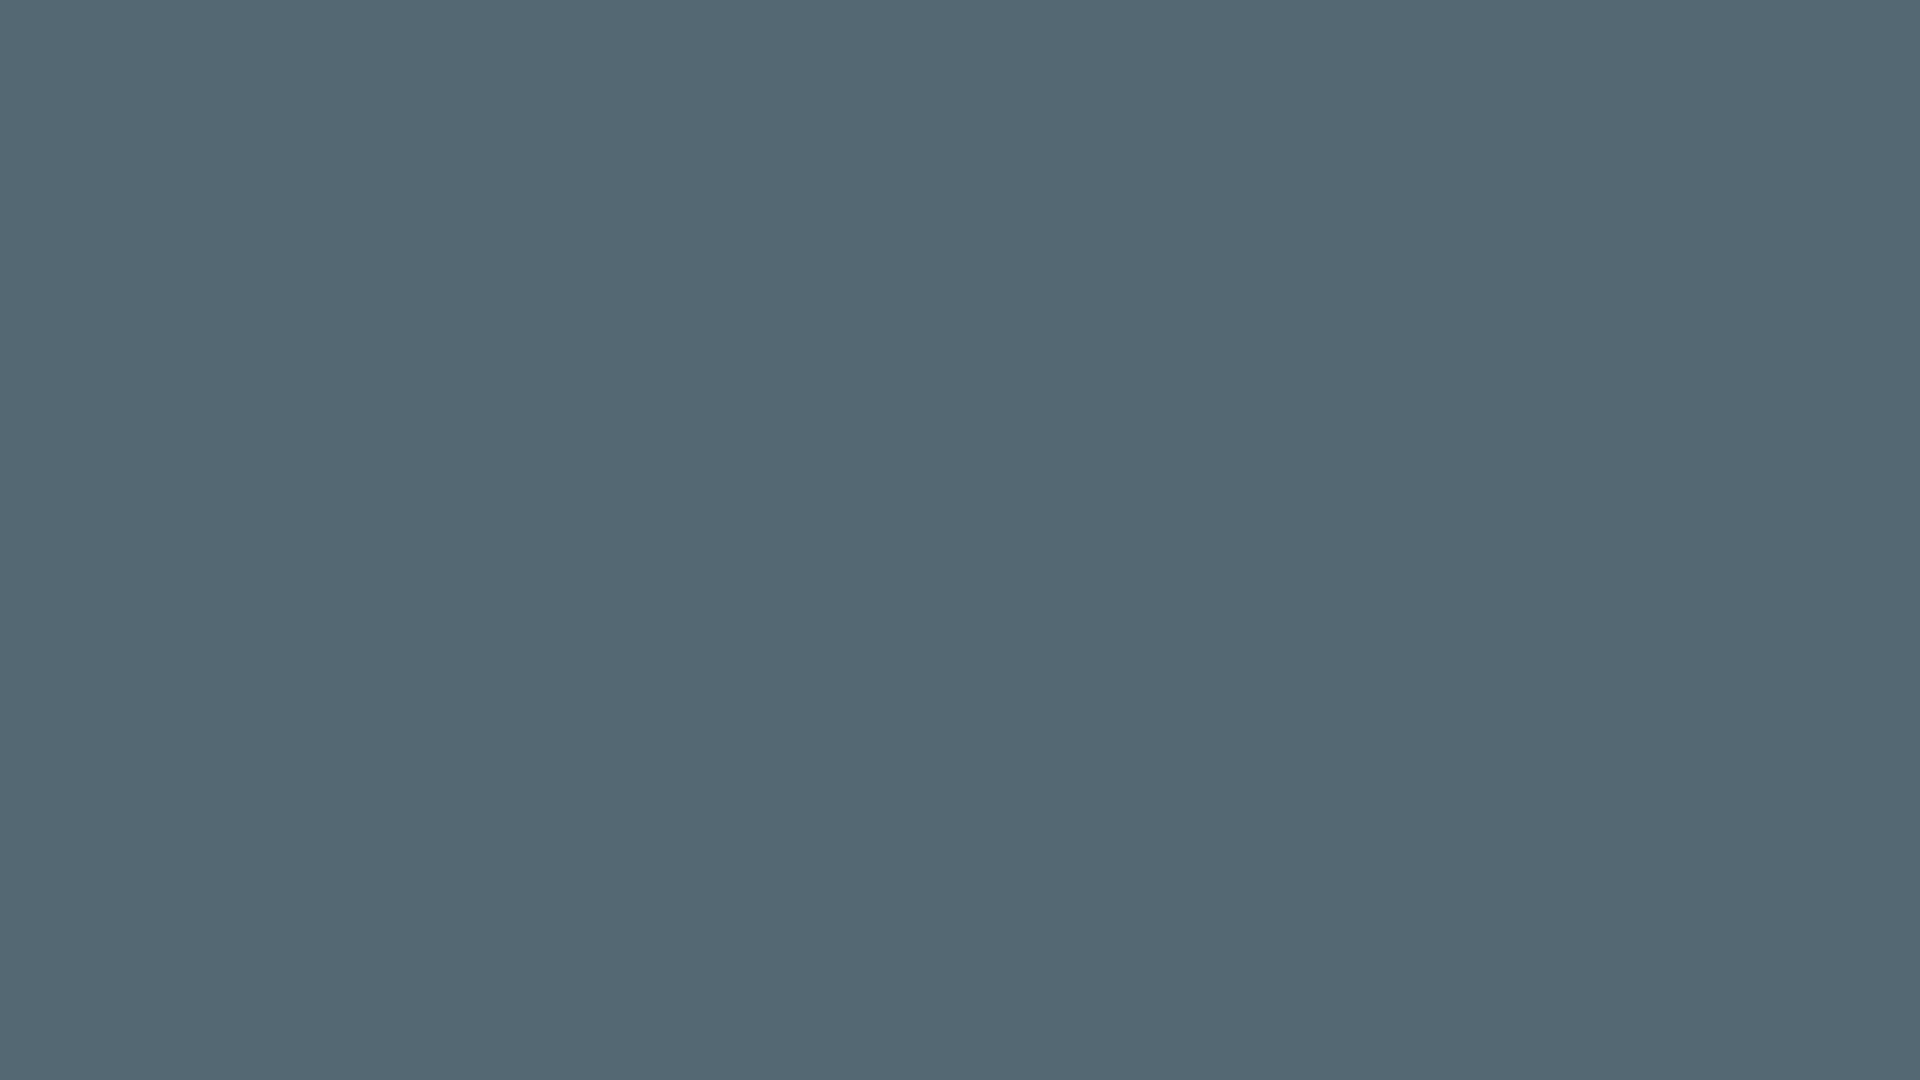 1920x1080 Cadet Solid Color Background